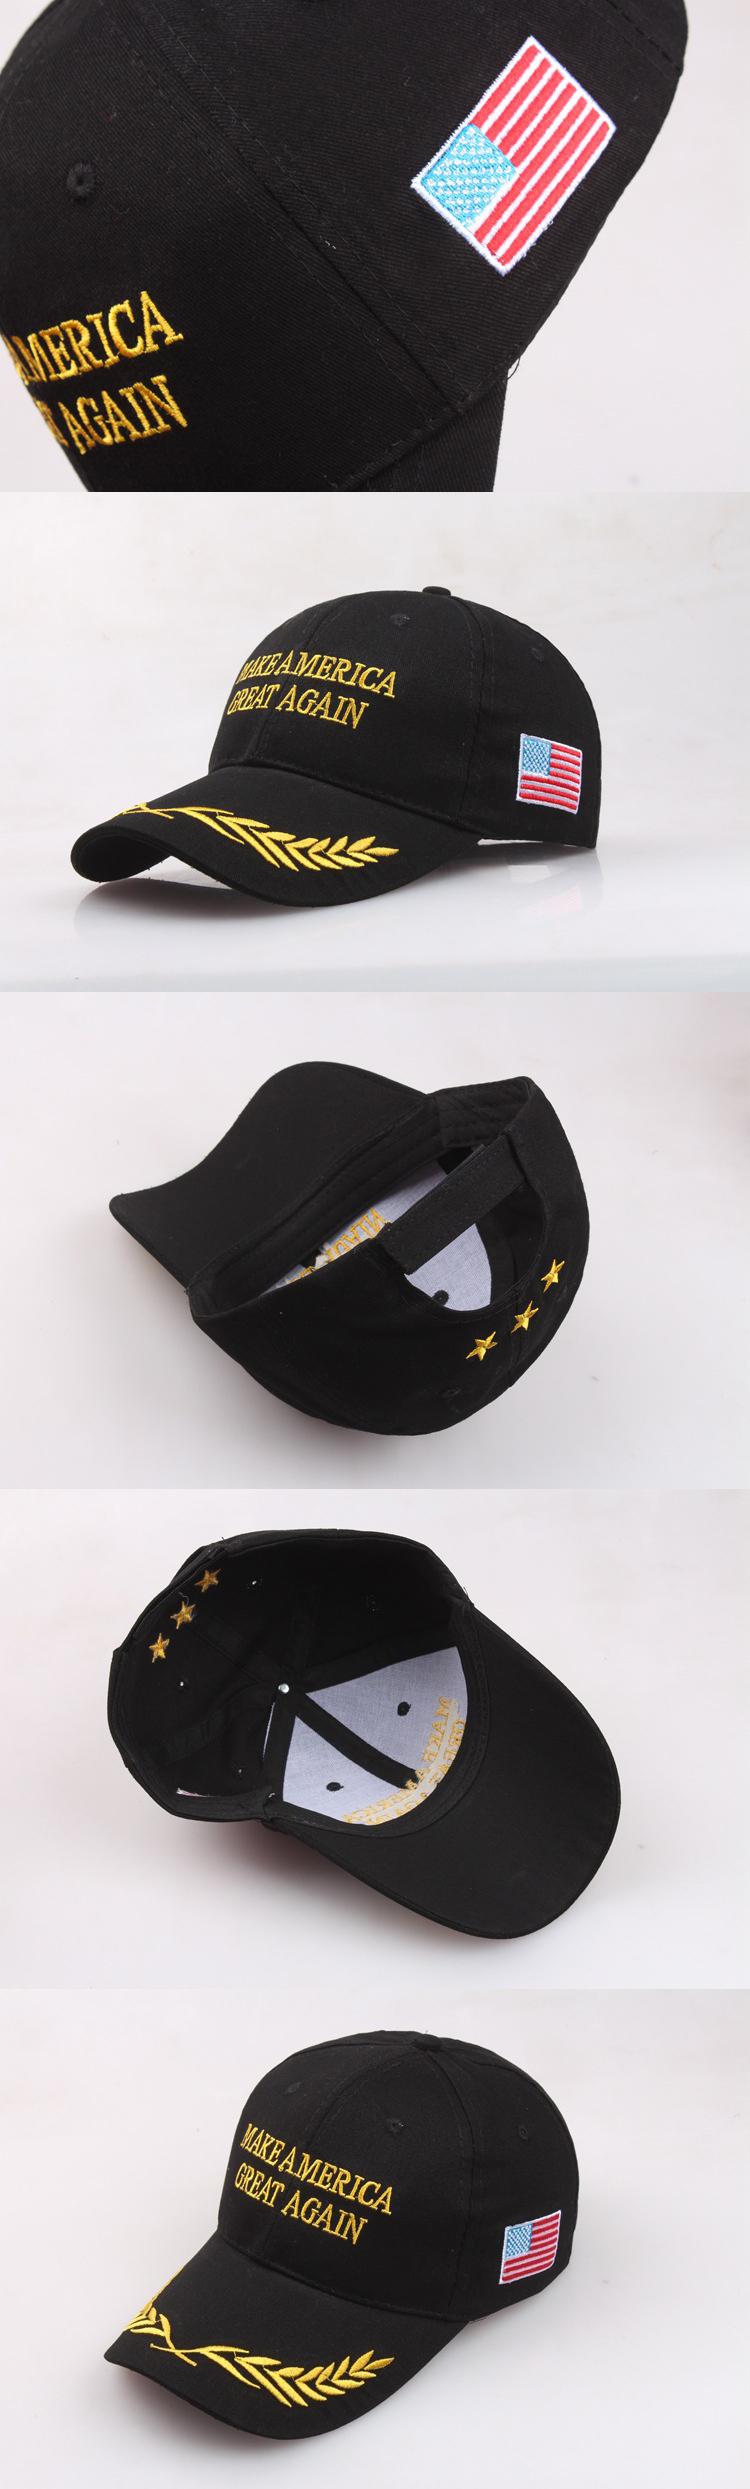 3e9004e5edd Hot Sell Unisex Sun Hat Cap Make America Great Again American Hat Baseball  Dad Hats Unisex